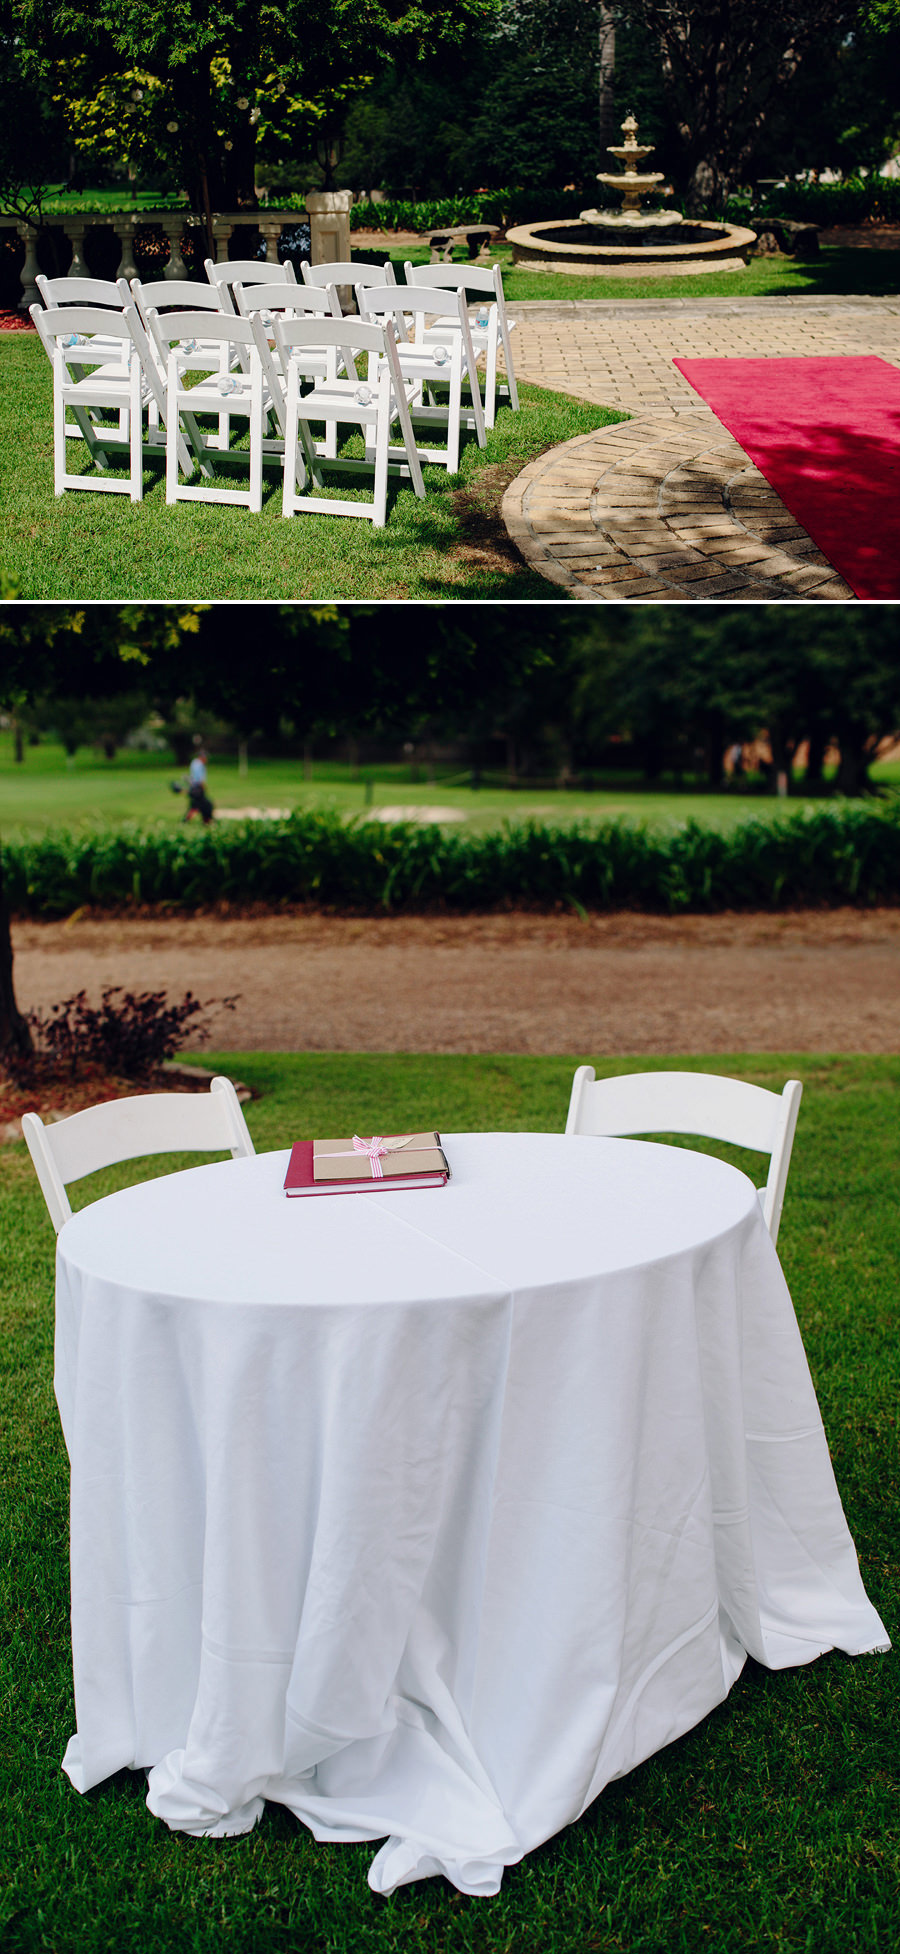 Oatlands House Wedding Photographer: Ceremony details